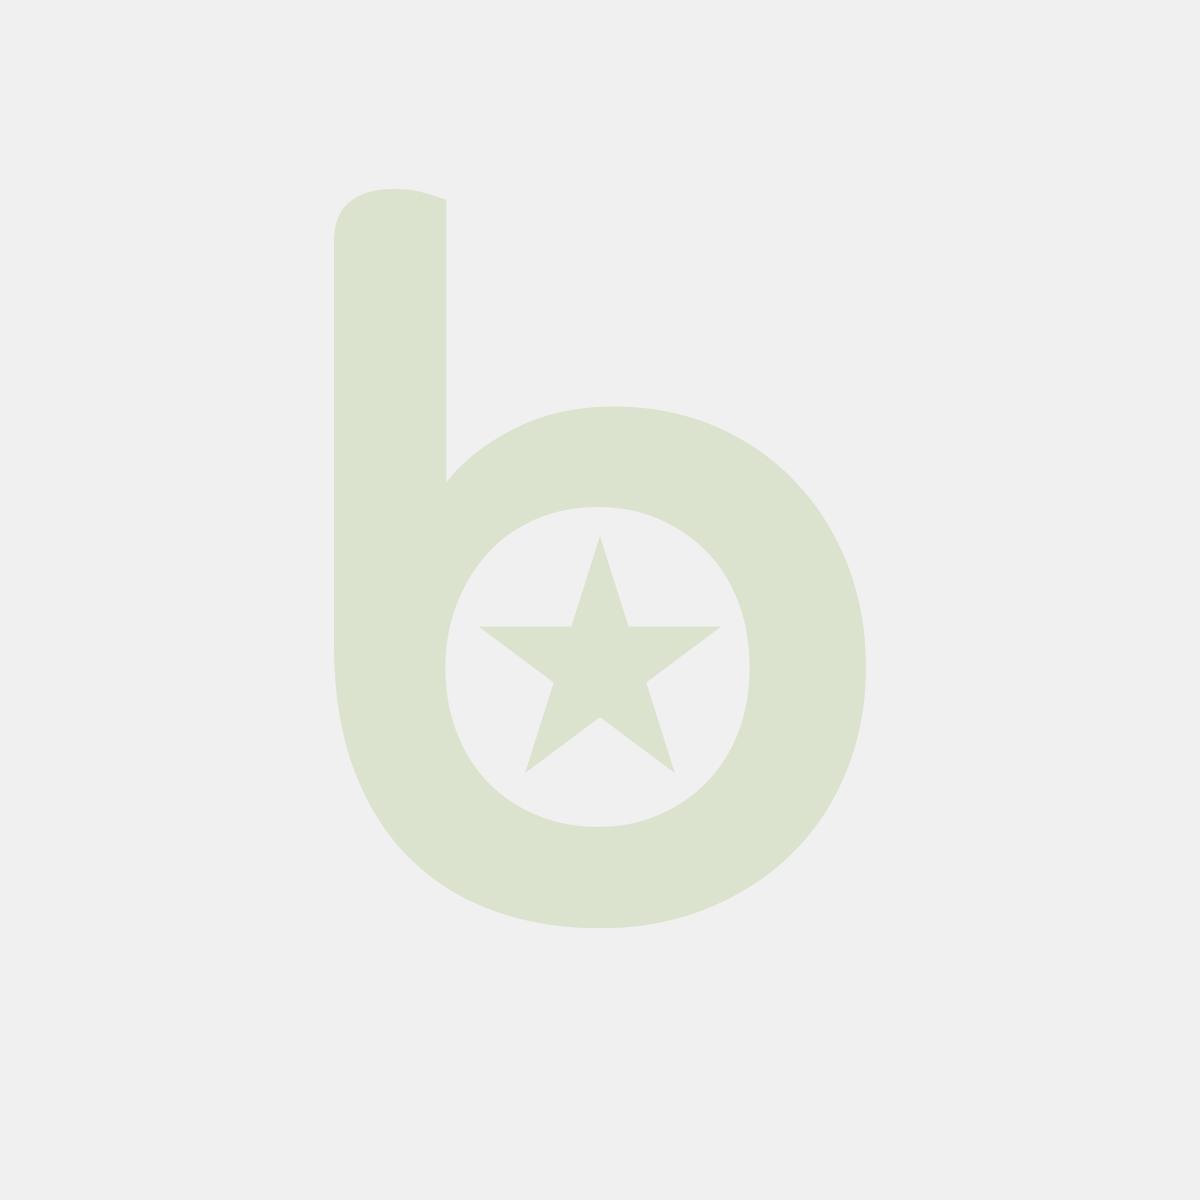 FINGERFOOD - z trzciny cukrowej PLA mini kubek 220ml, 8x8x6,3cm, op. 30 sztuk